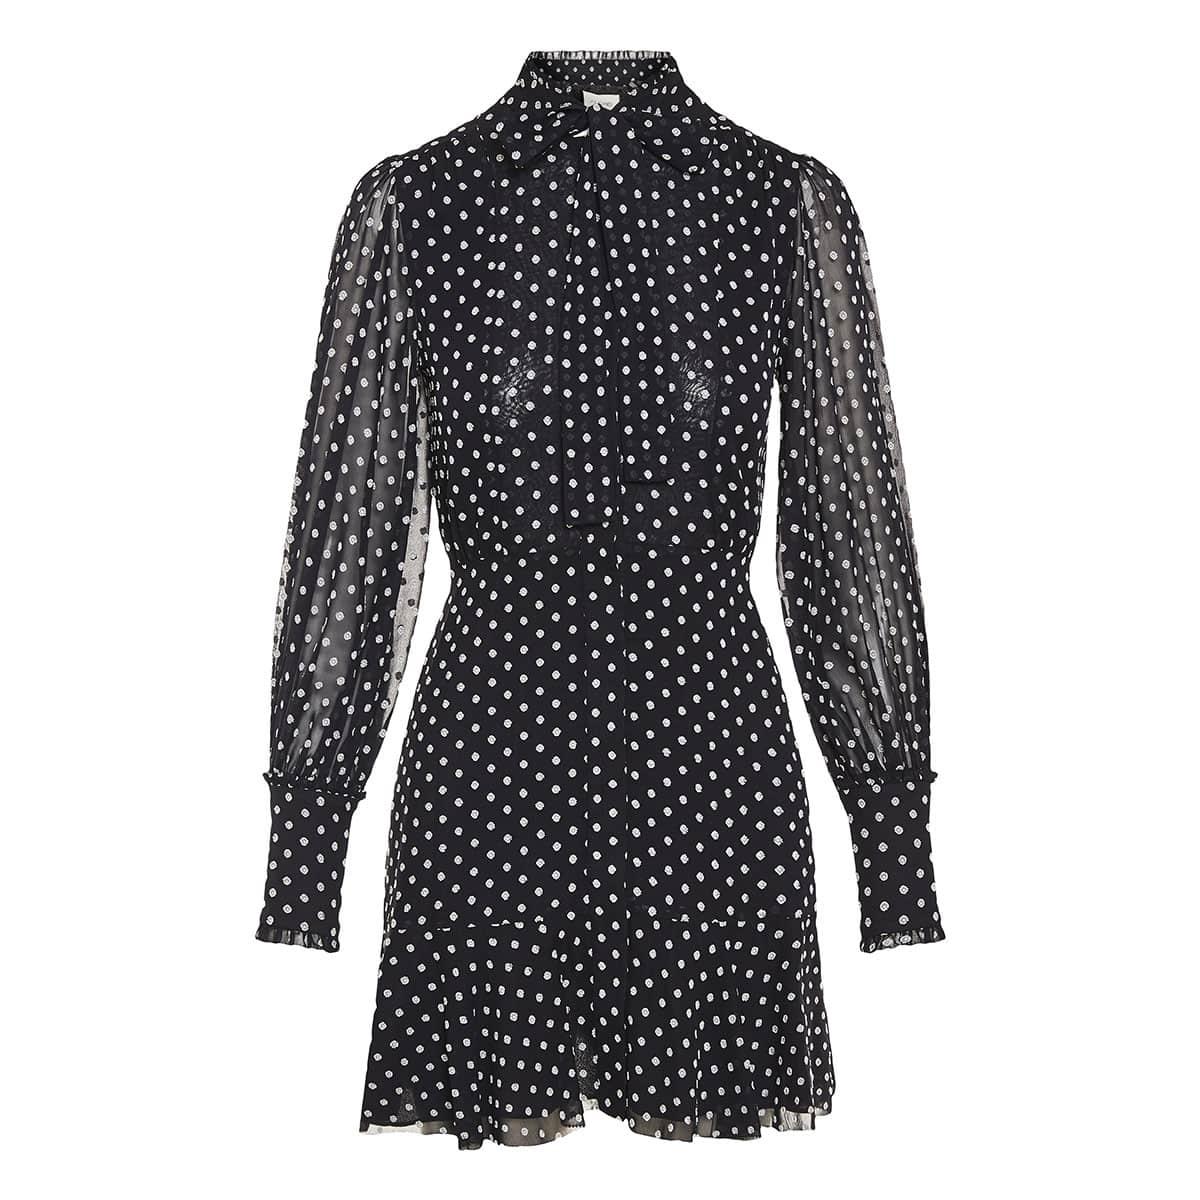 Ivette bow-tie polka-dot mini dress